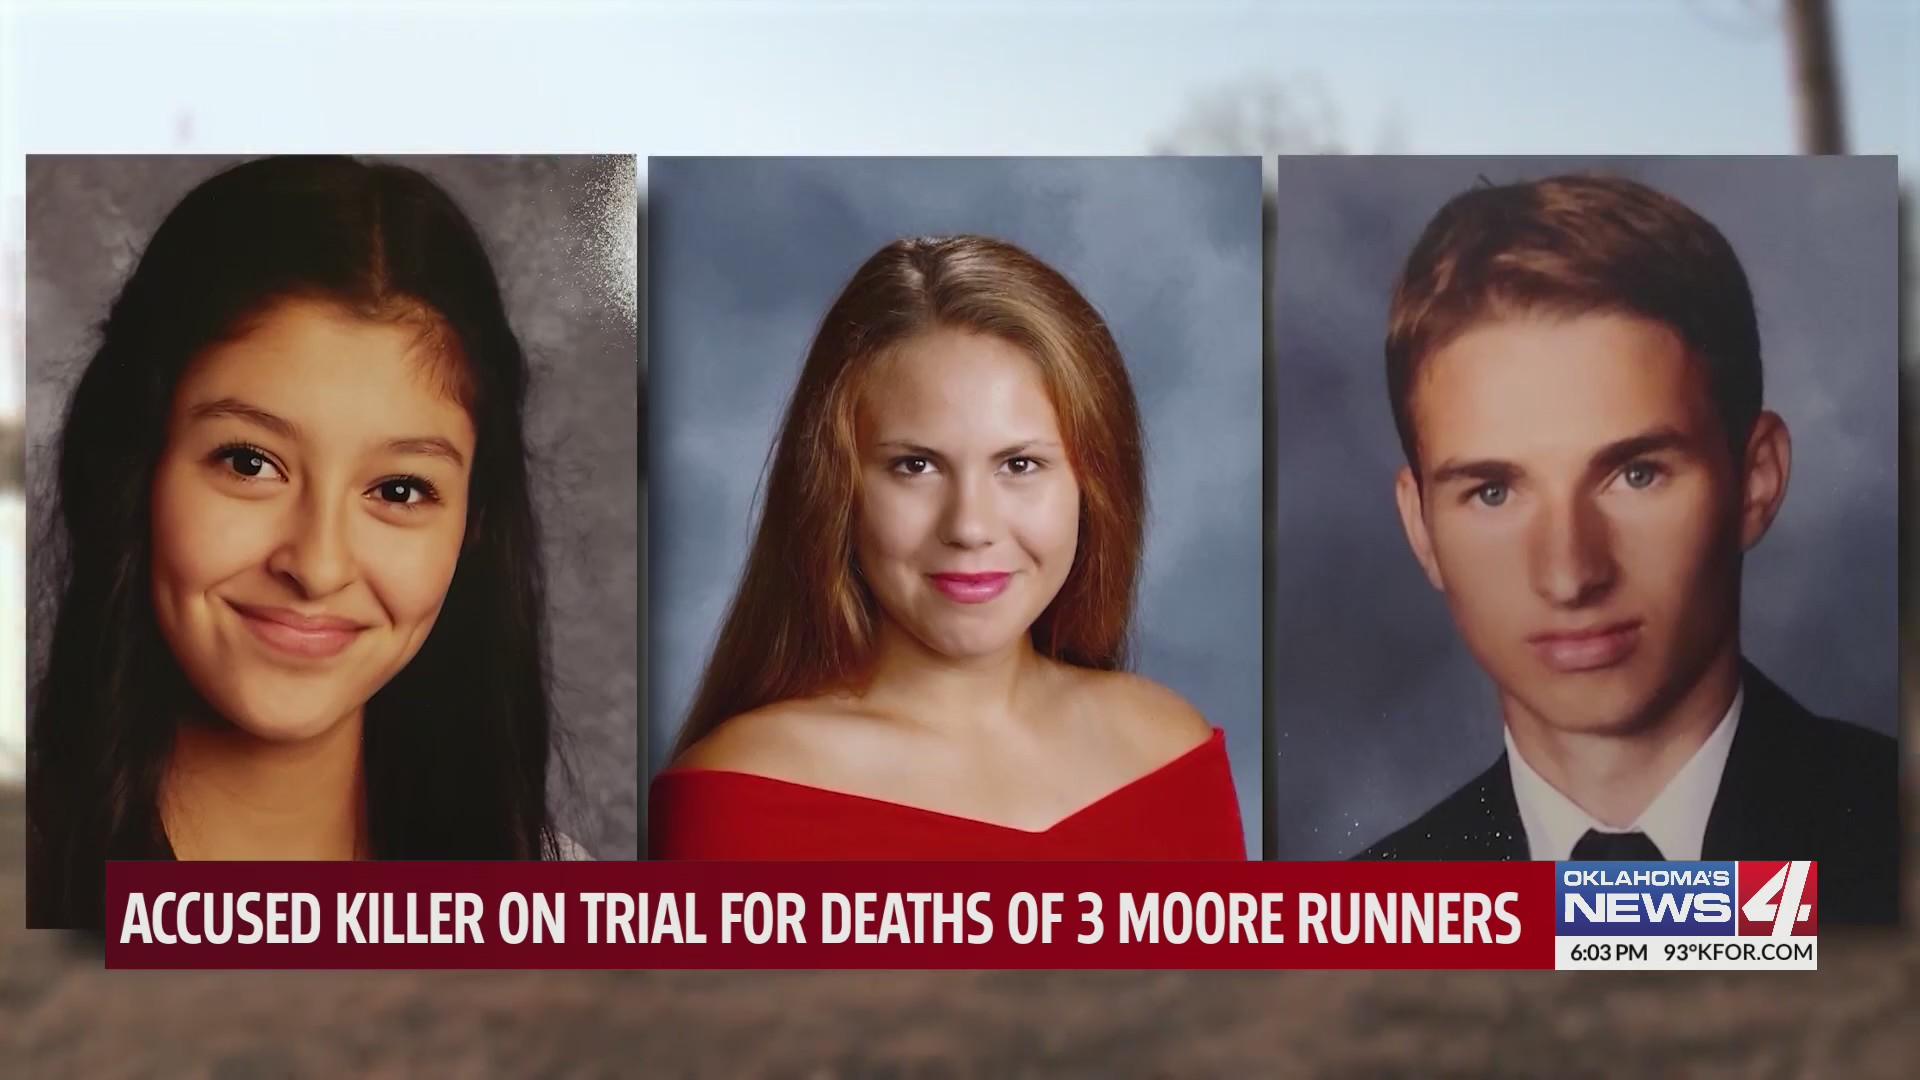 16-year-old Yuridia Martinez, 17-year-old Rachel Freeman and 18-year-old Kolby Crum